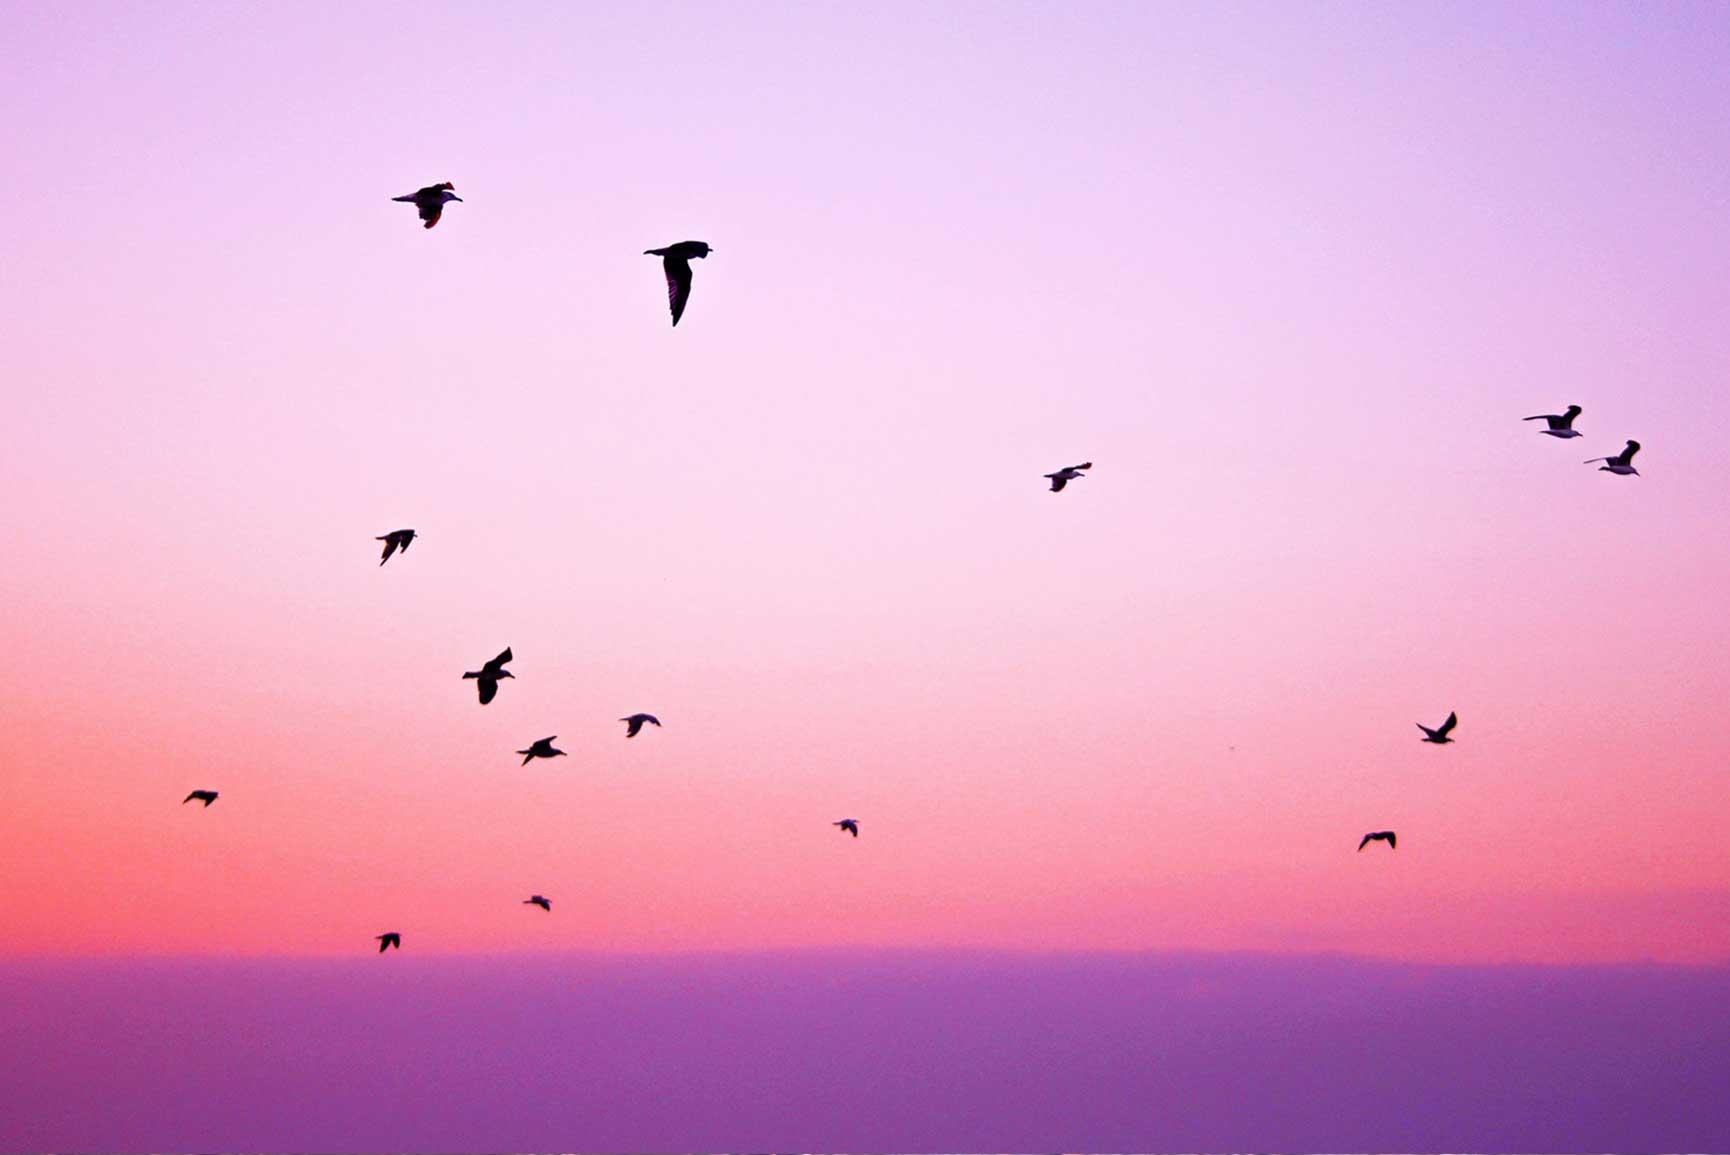 sunset wallpaper,sky,pink,purple,bird,morning